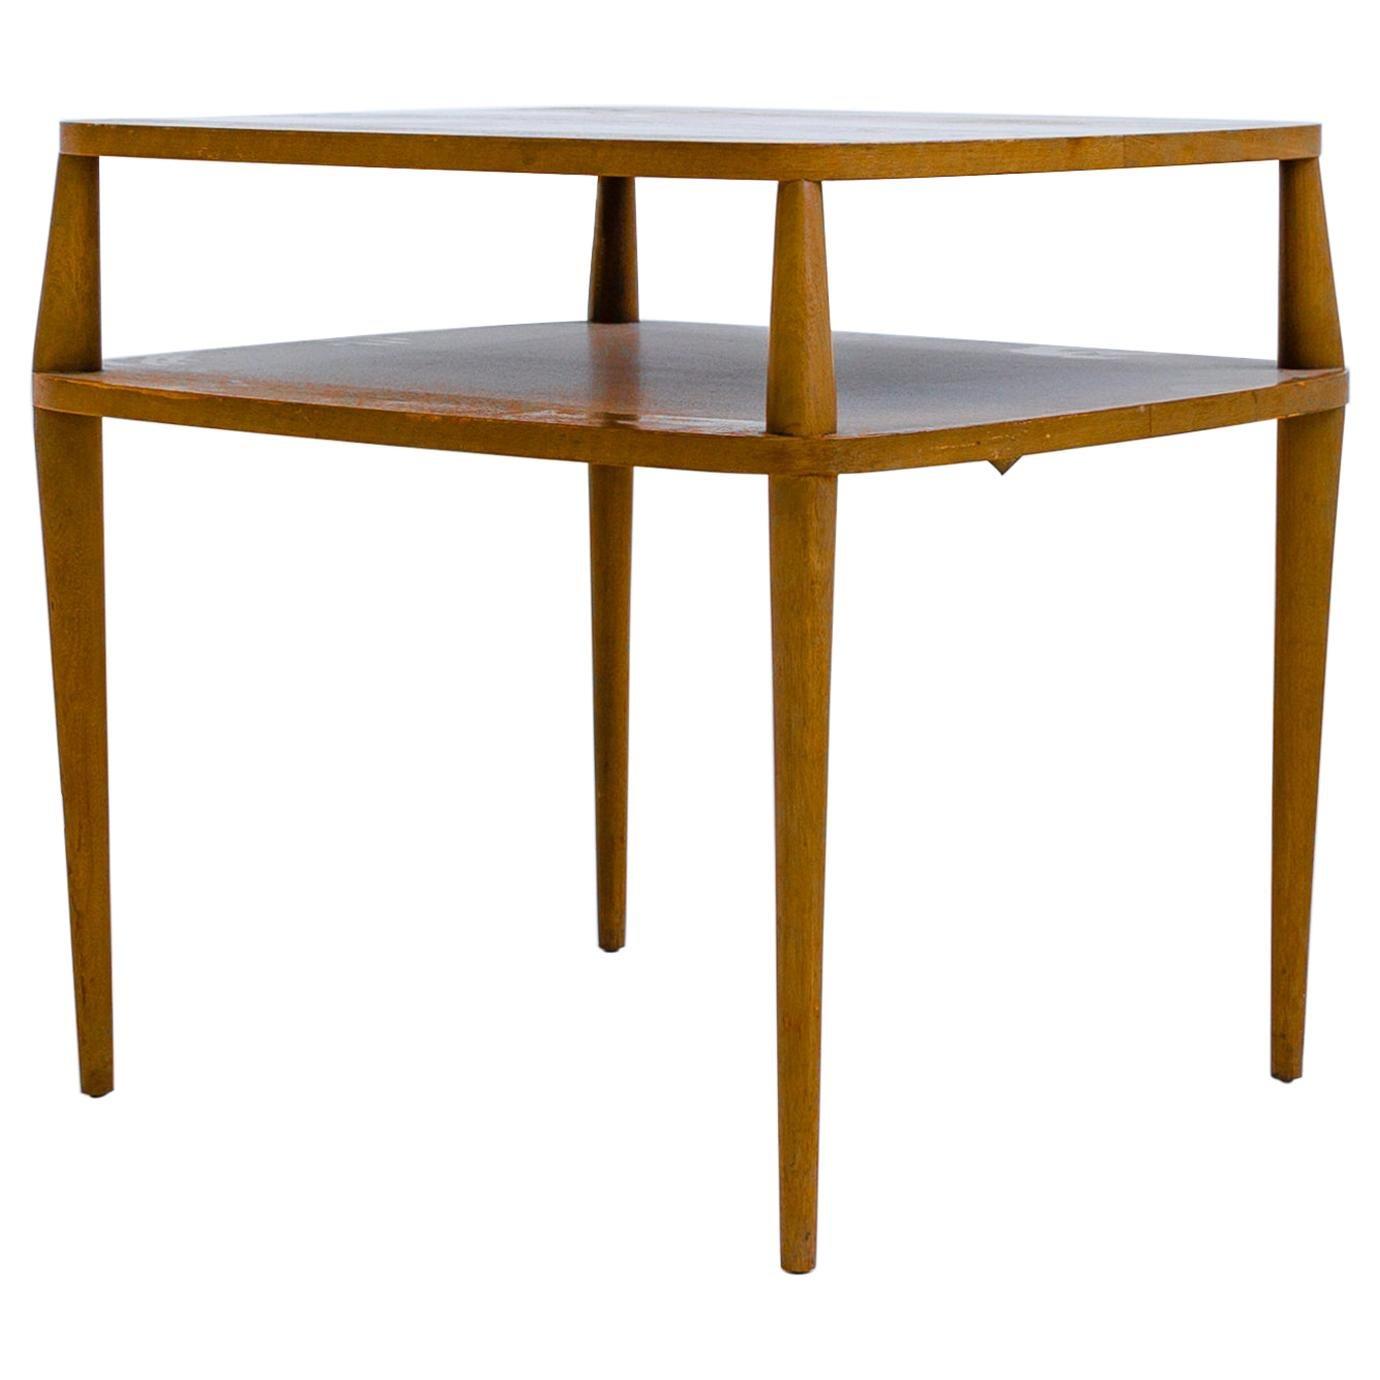 Vintage Bertha Schaefer Walnut Side Table for Singer & Sons, 20th Century, USA